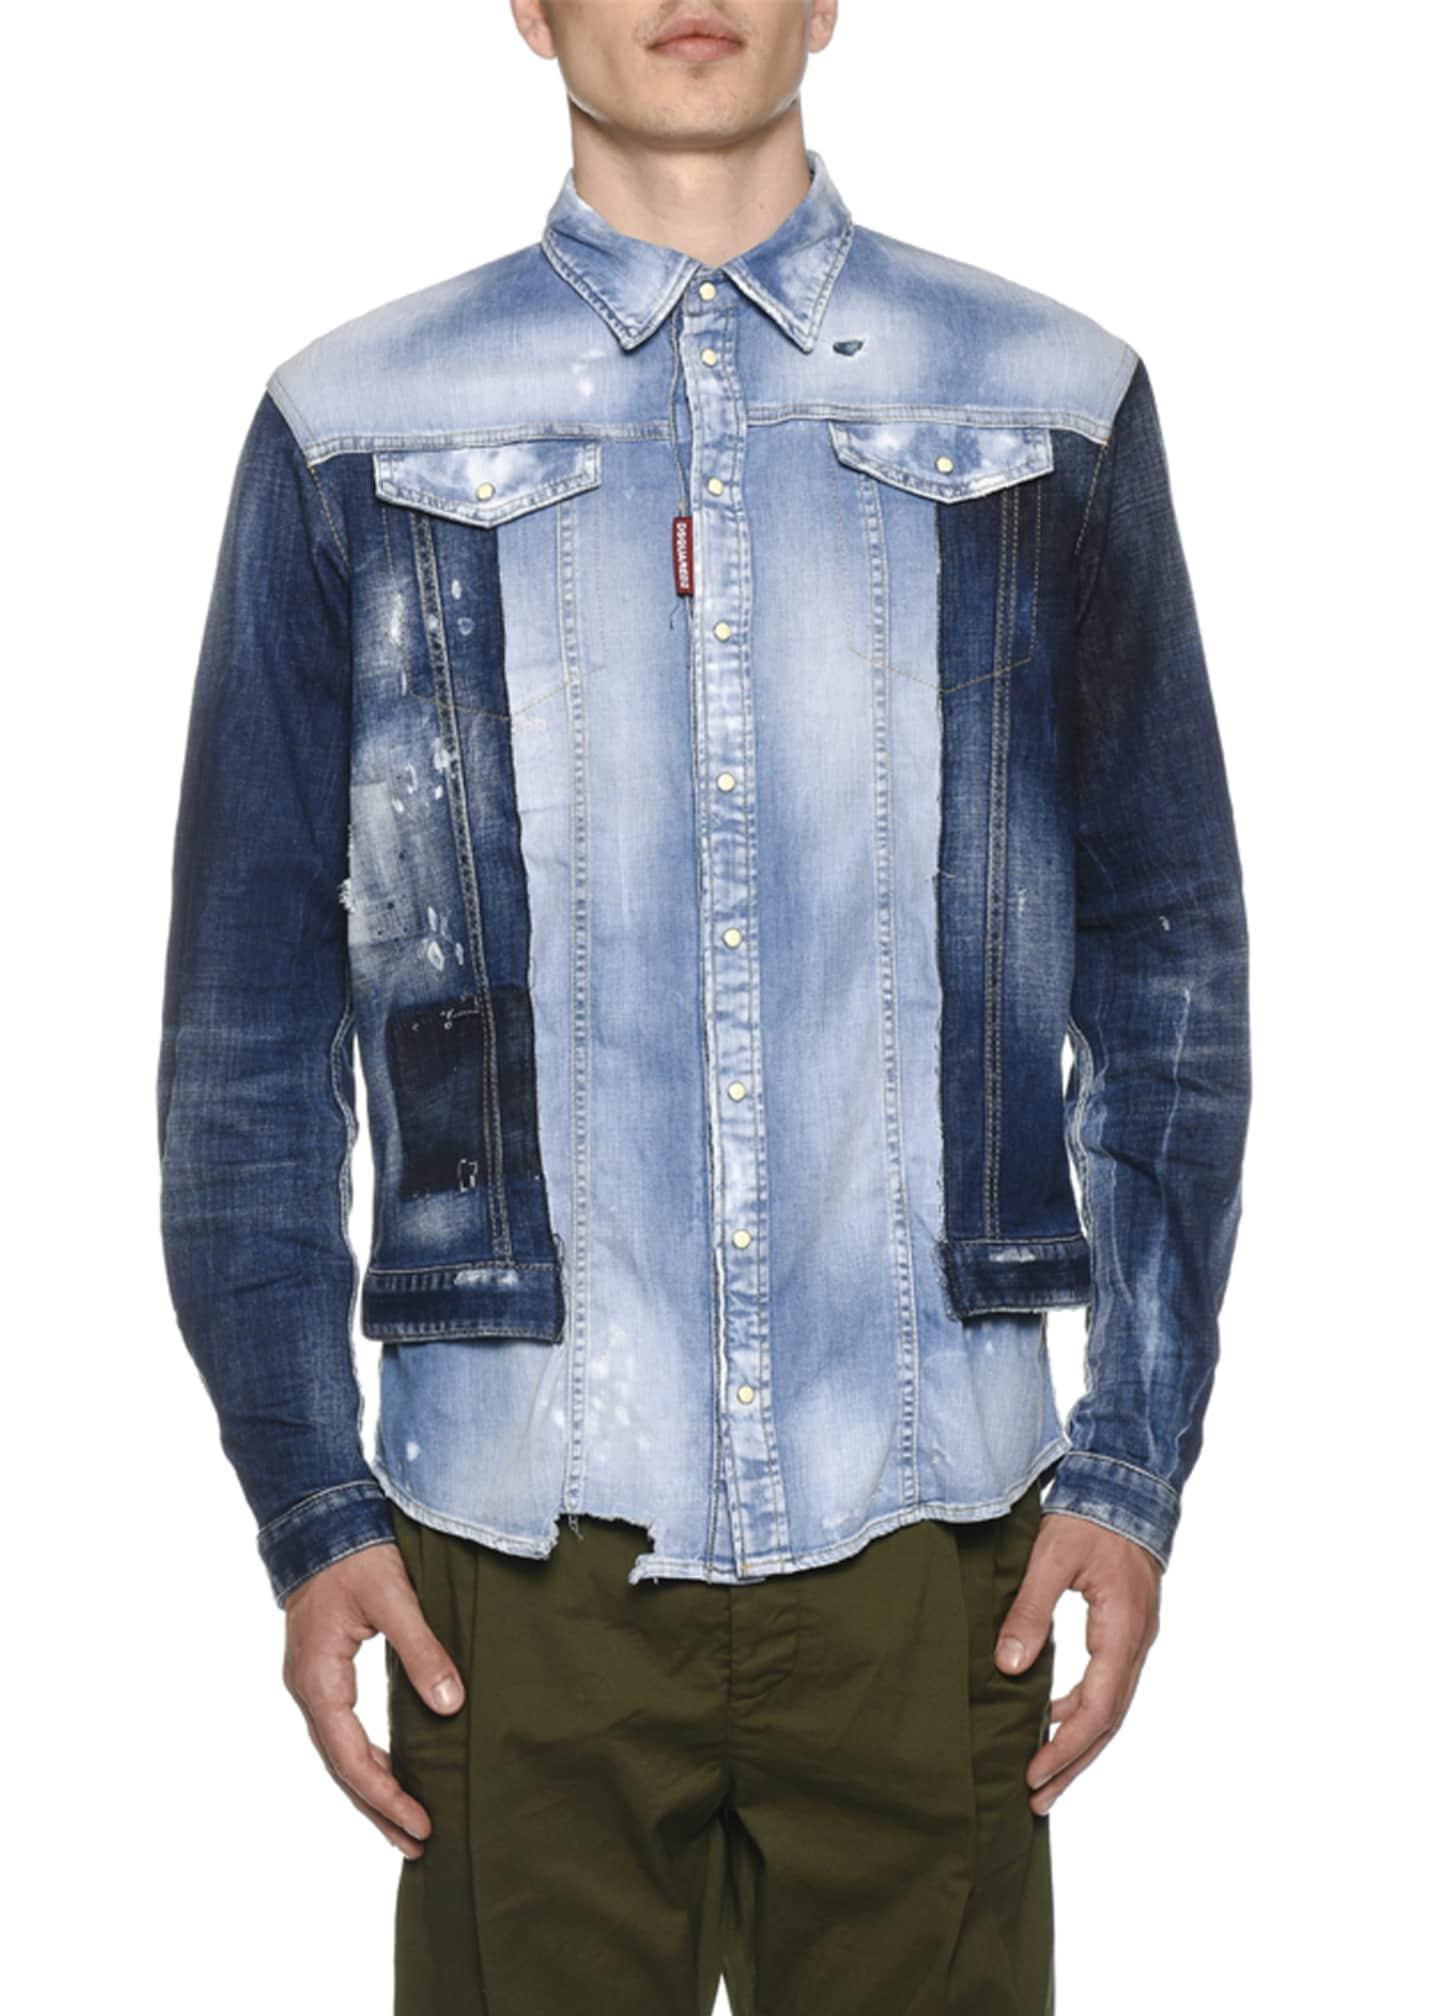 Dsquared2 Men's Mixed-Wash Denim Shirt w/ Jean Jacket